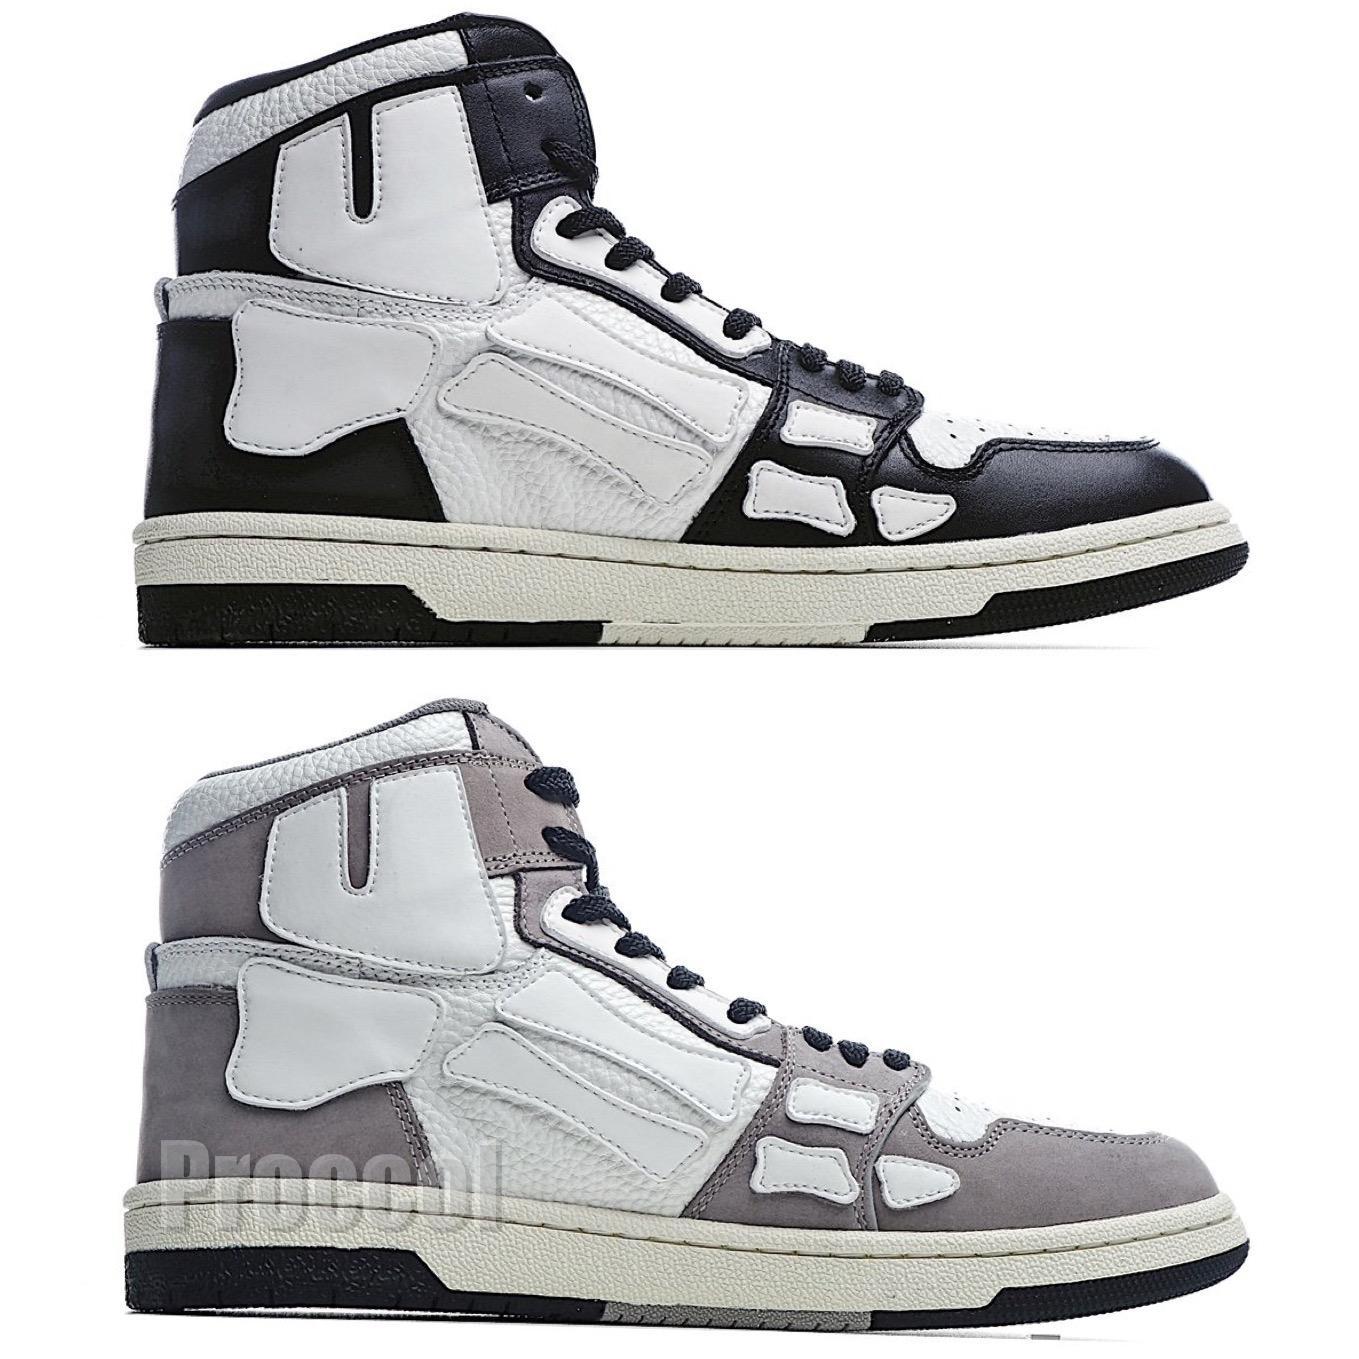 2021 Nuovo arrivo Top Quality 1 scarpe da uomo 1S Scheletro Scarpe Moda Alta Top Basket Scarpe Sneaker US 11